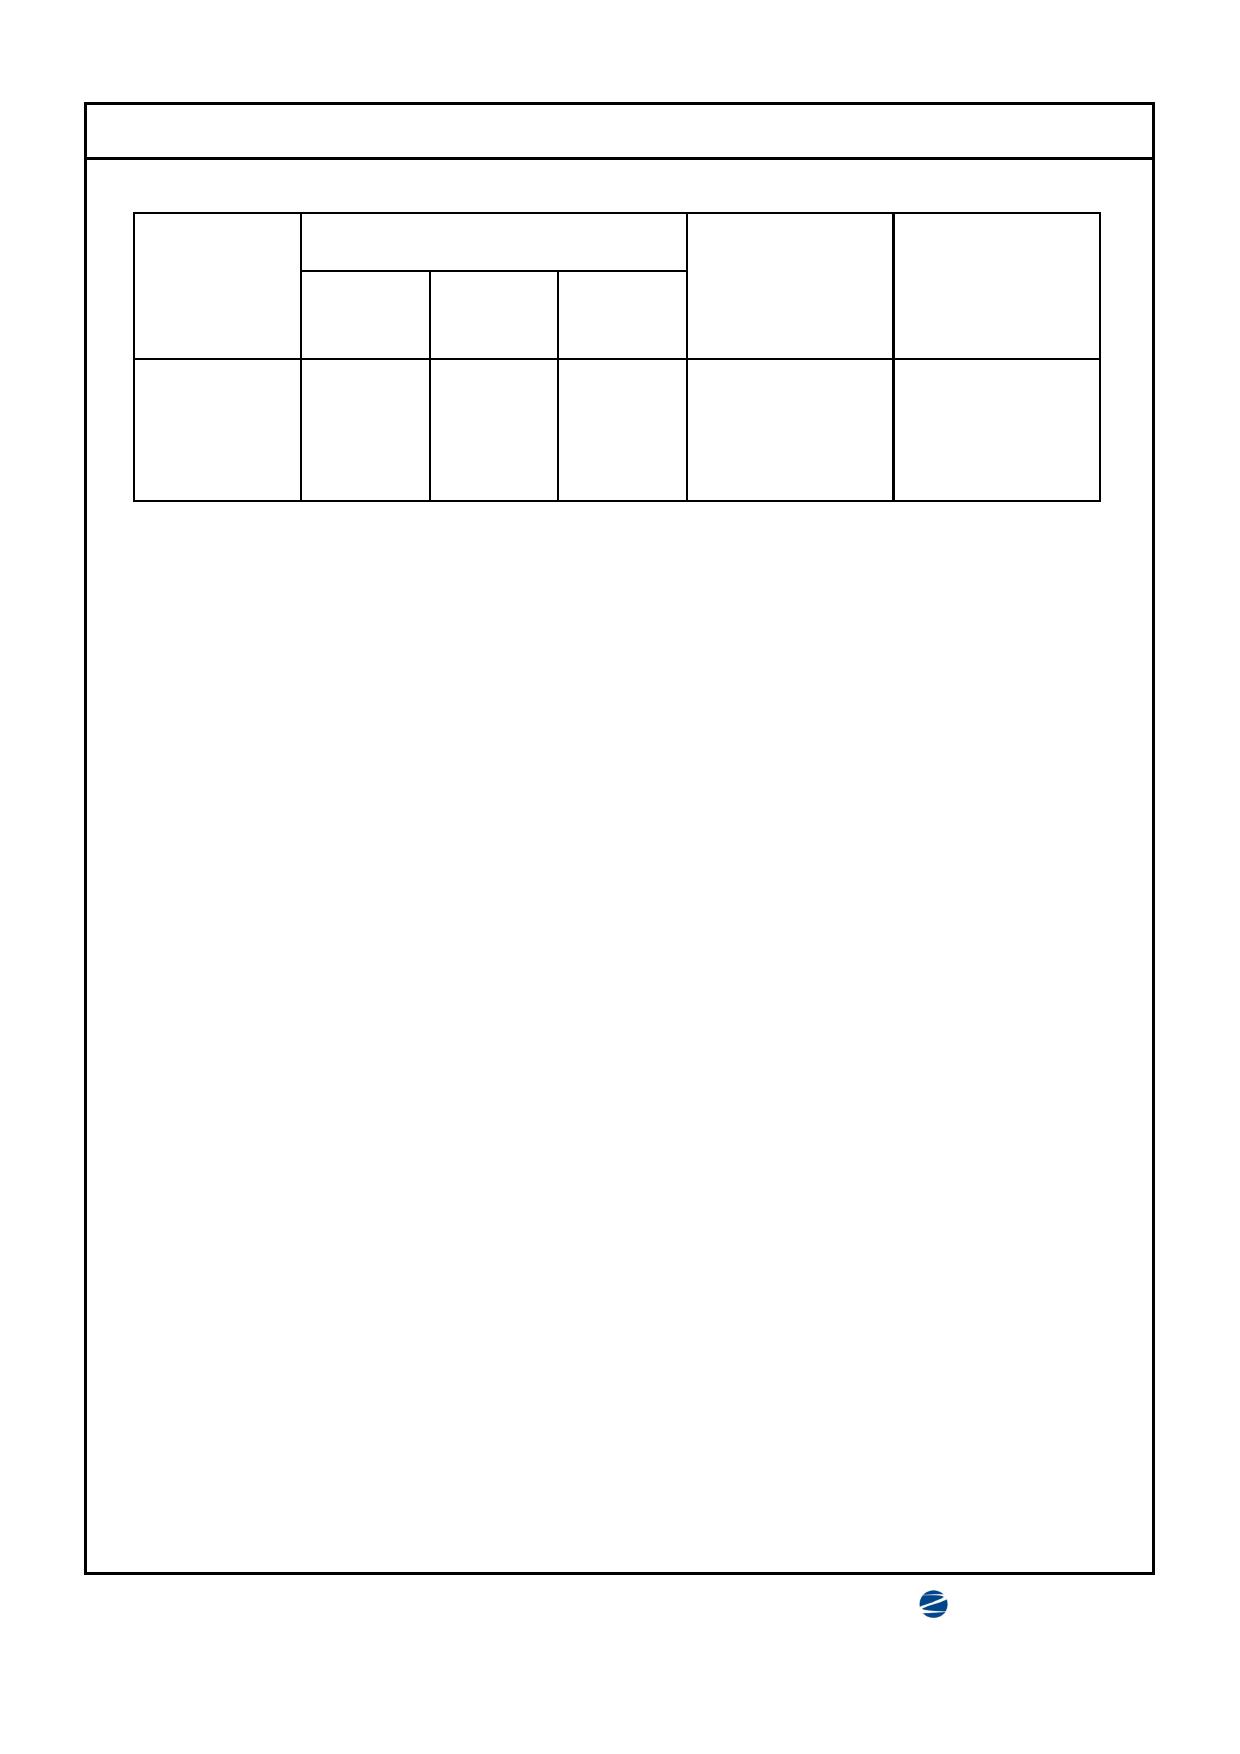 MBR10200CTSH pdf, ピン配列